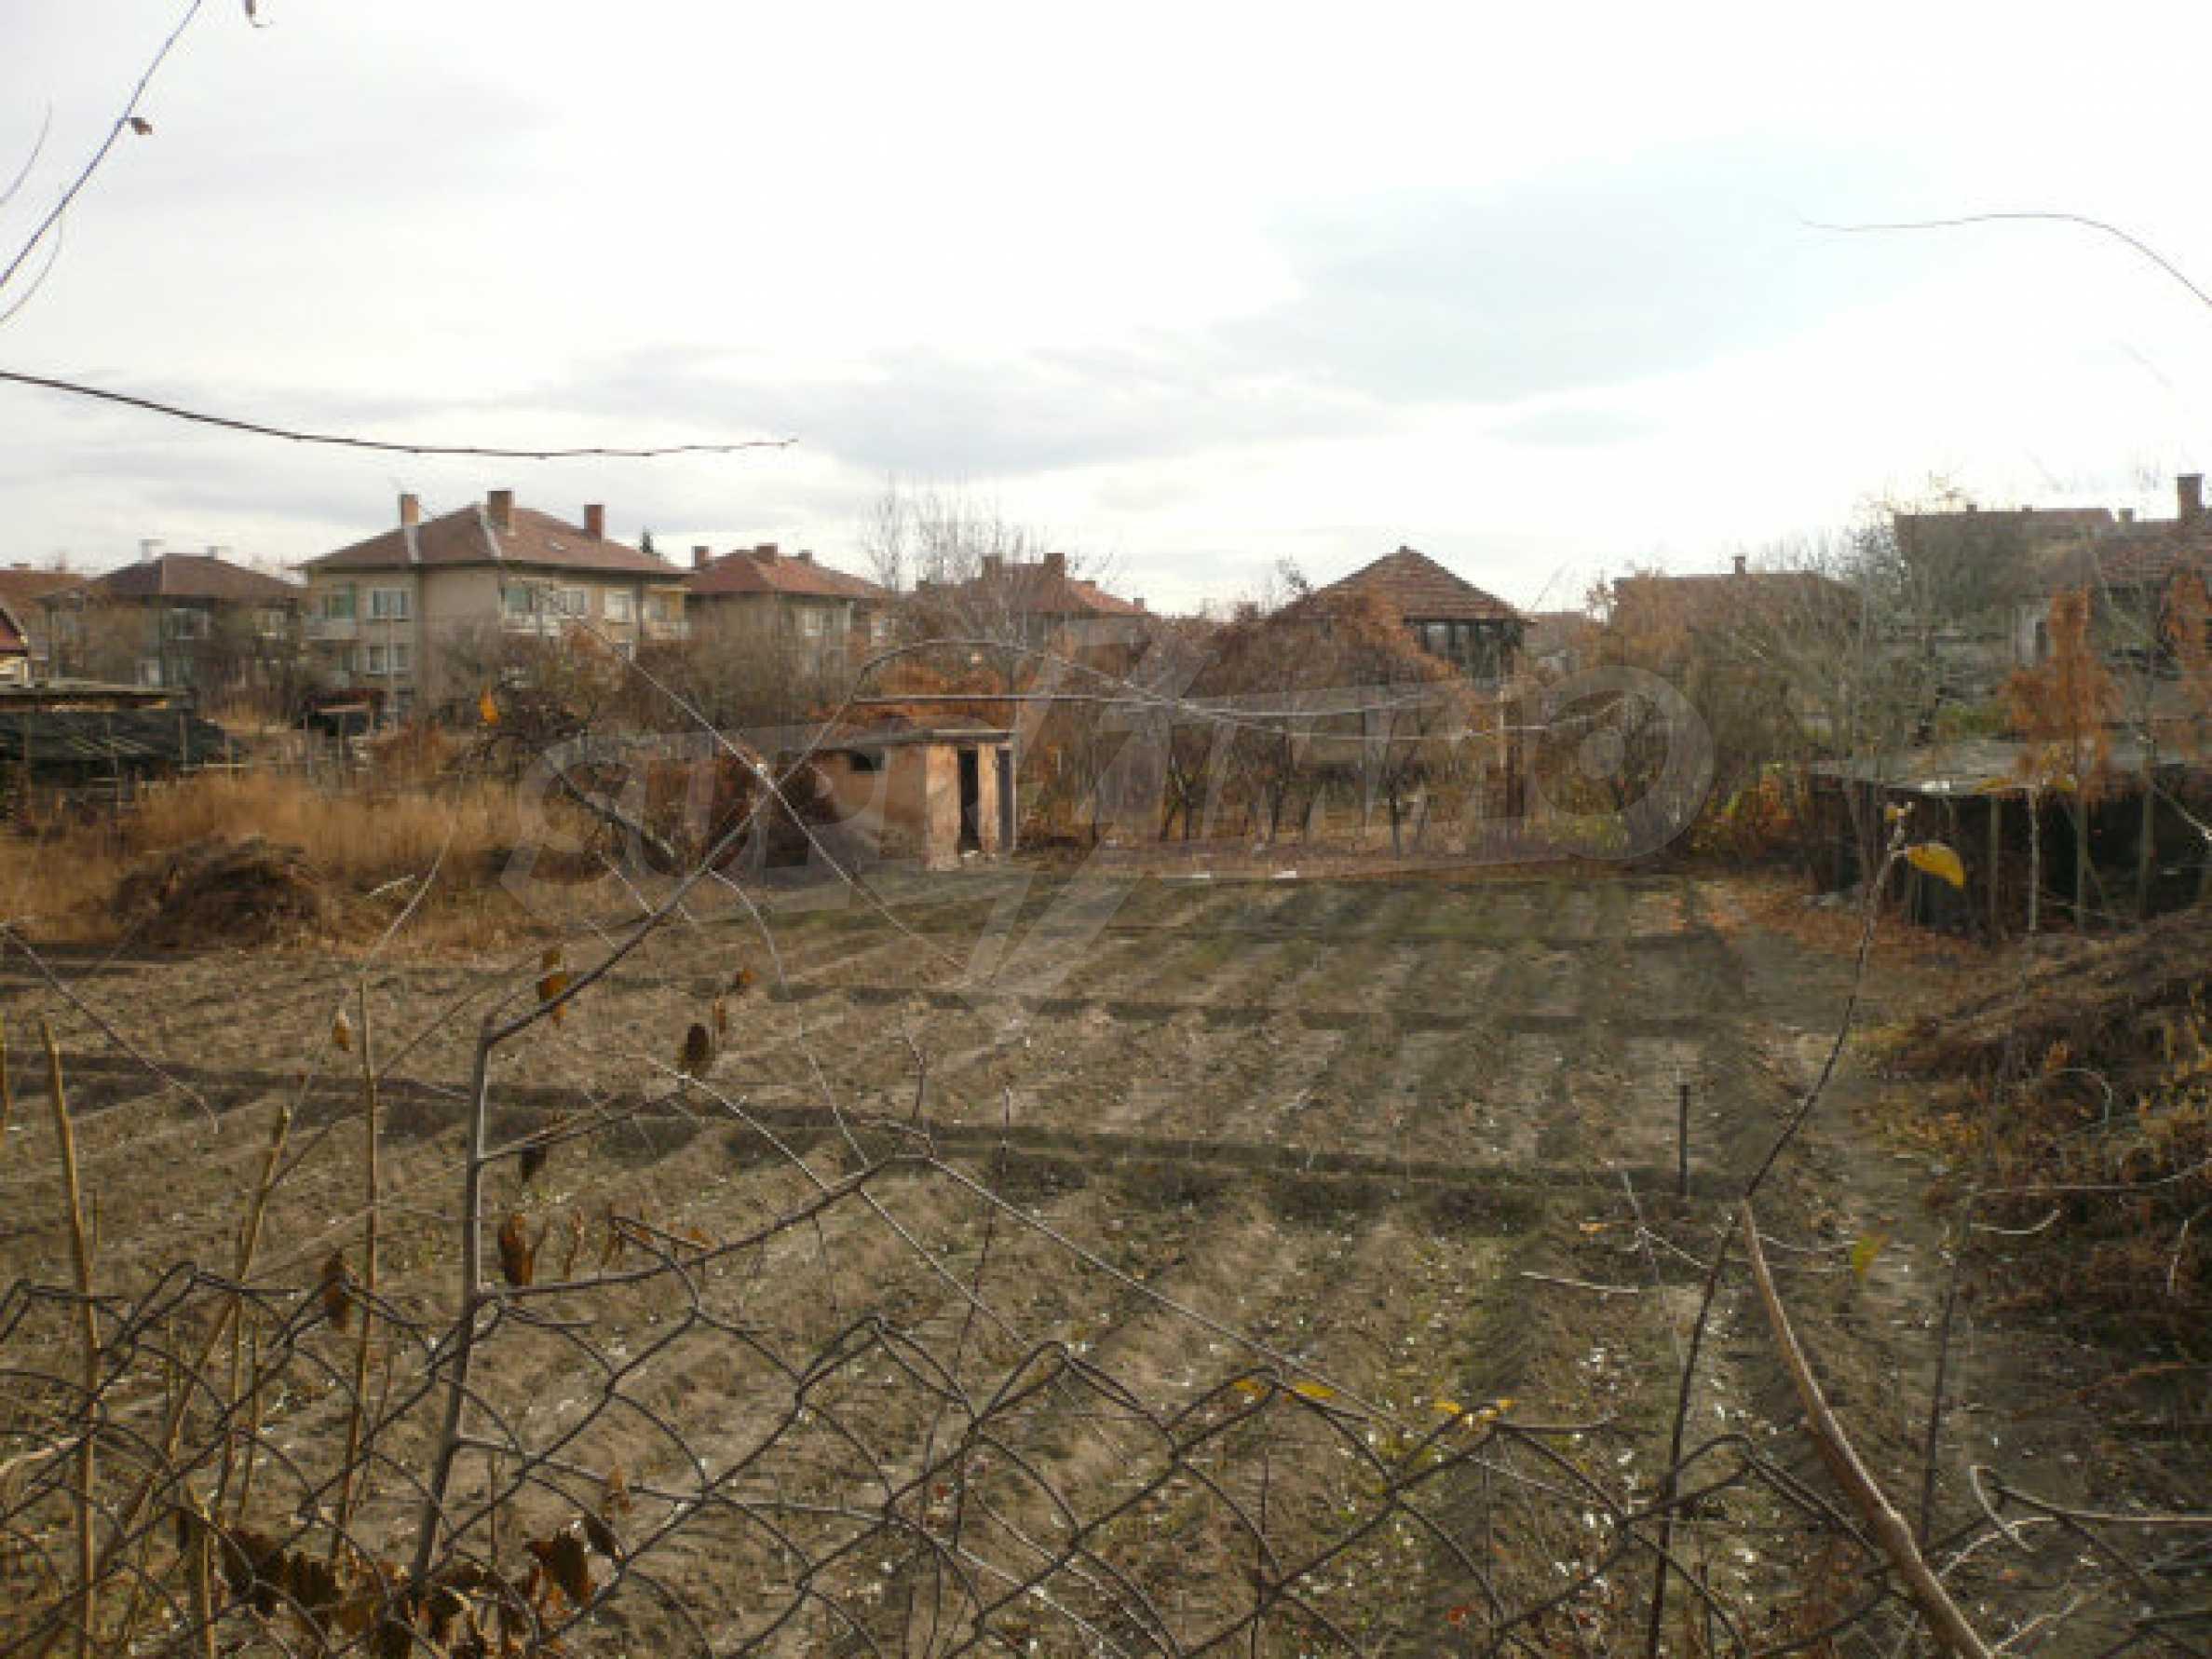 Участок под застройку дома в городе Видин 1